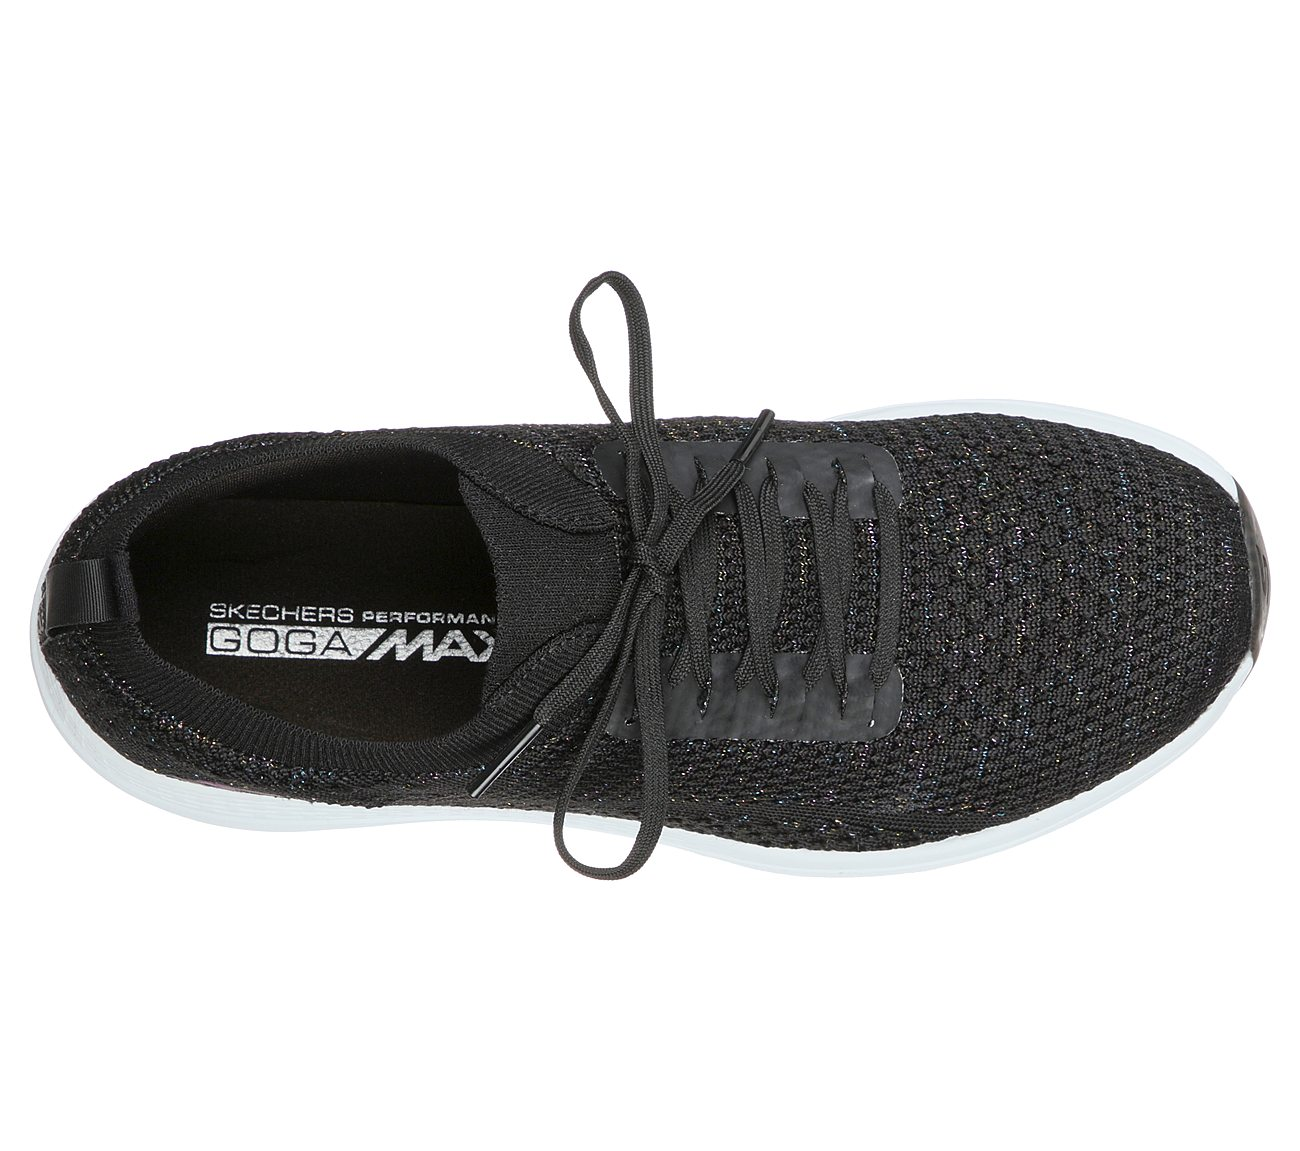 Skechers Women's Go Golf Max Glitter Black Golf Shoe